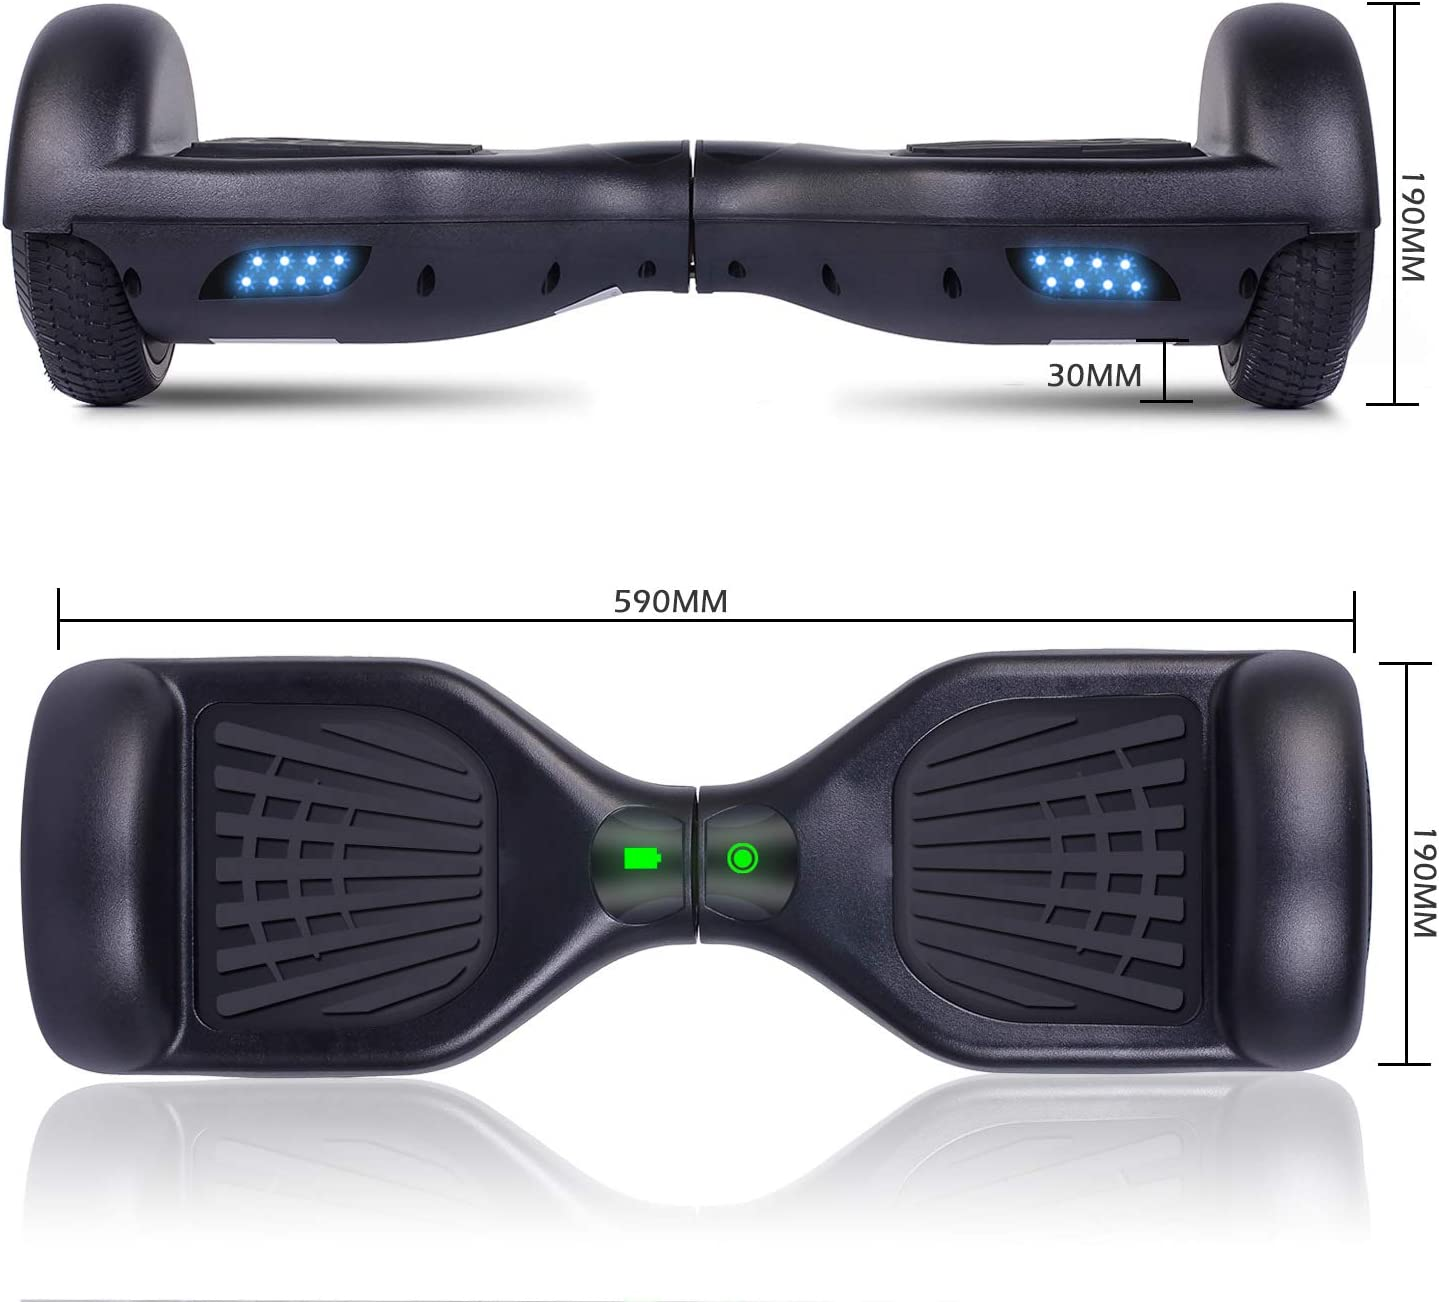 Amazon.com: Felimoda Tabla de dos ruedas autoequilibrada con ...